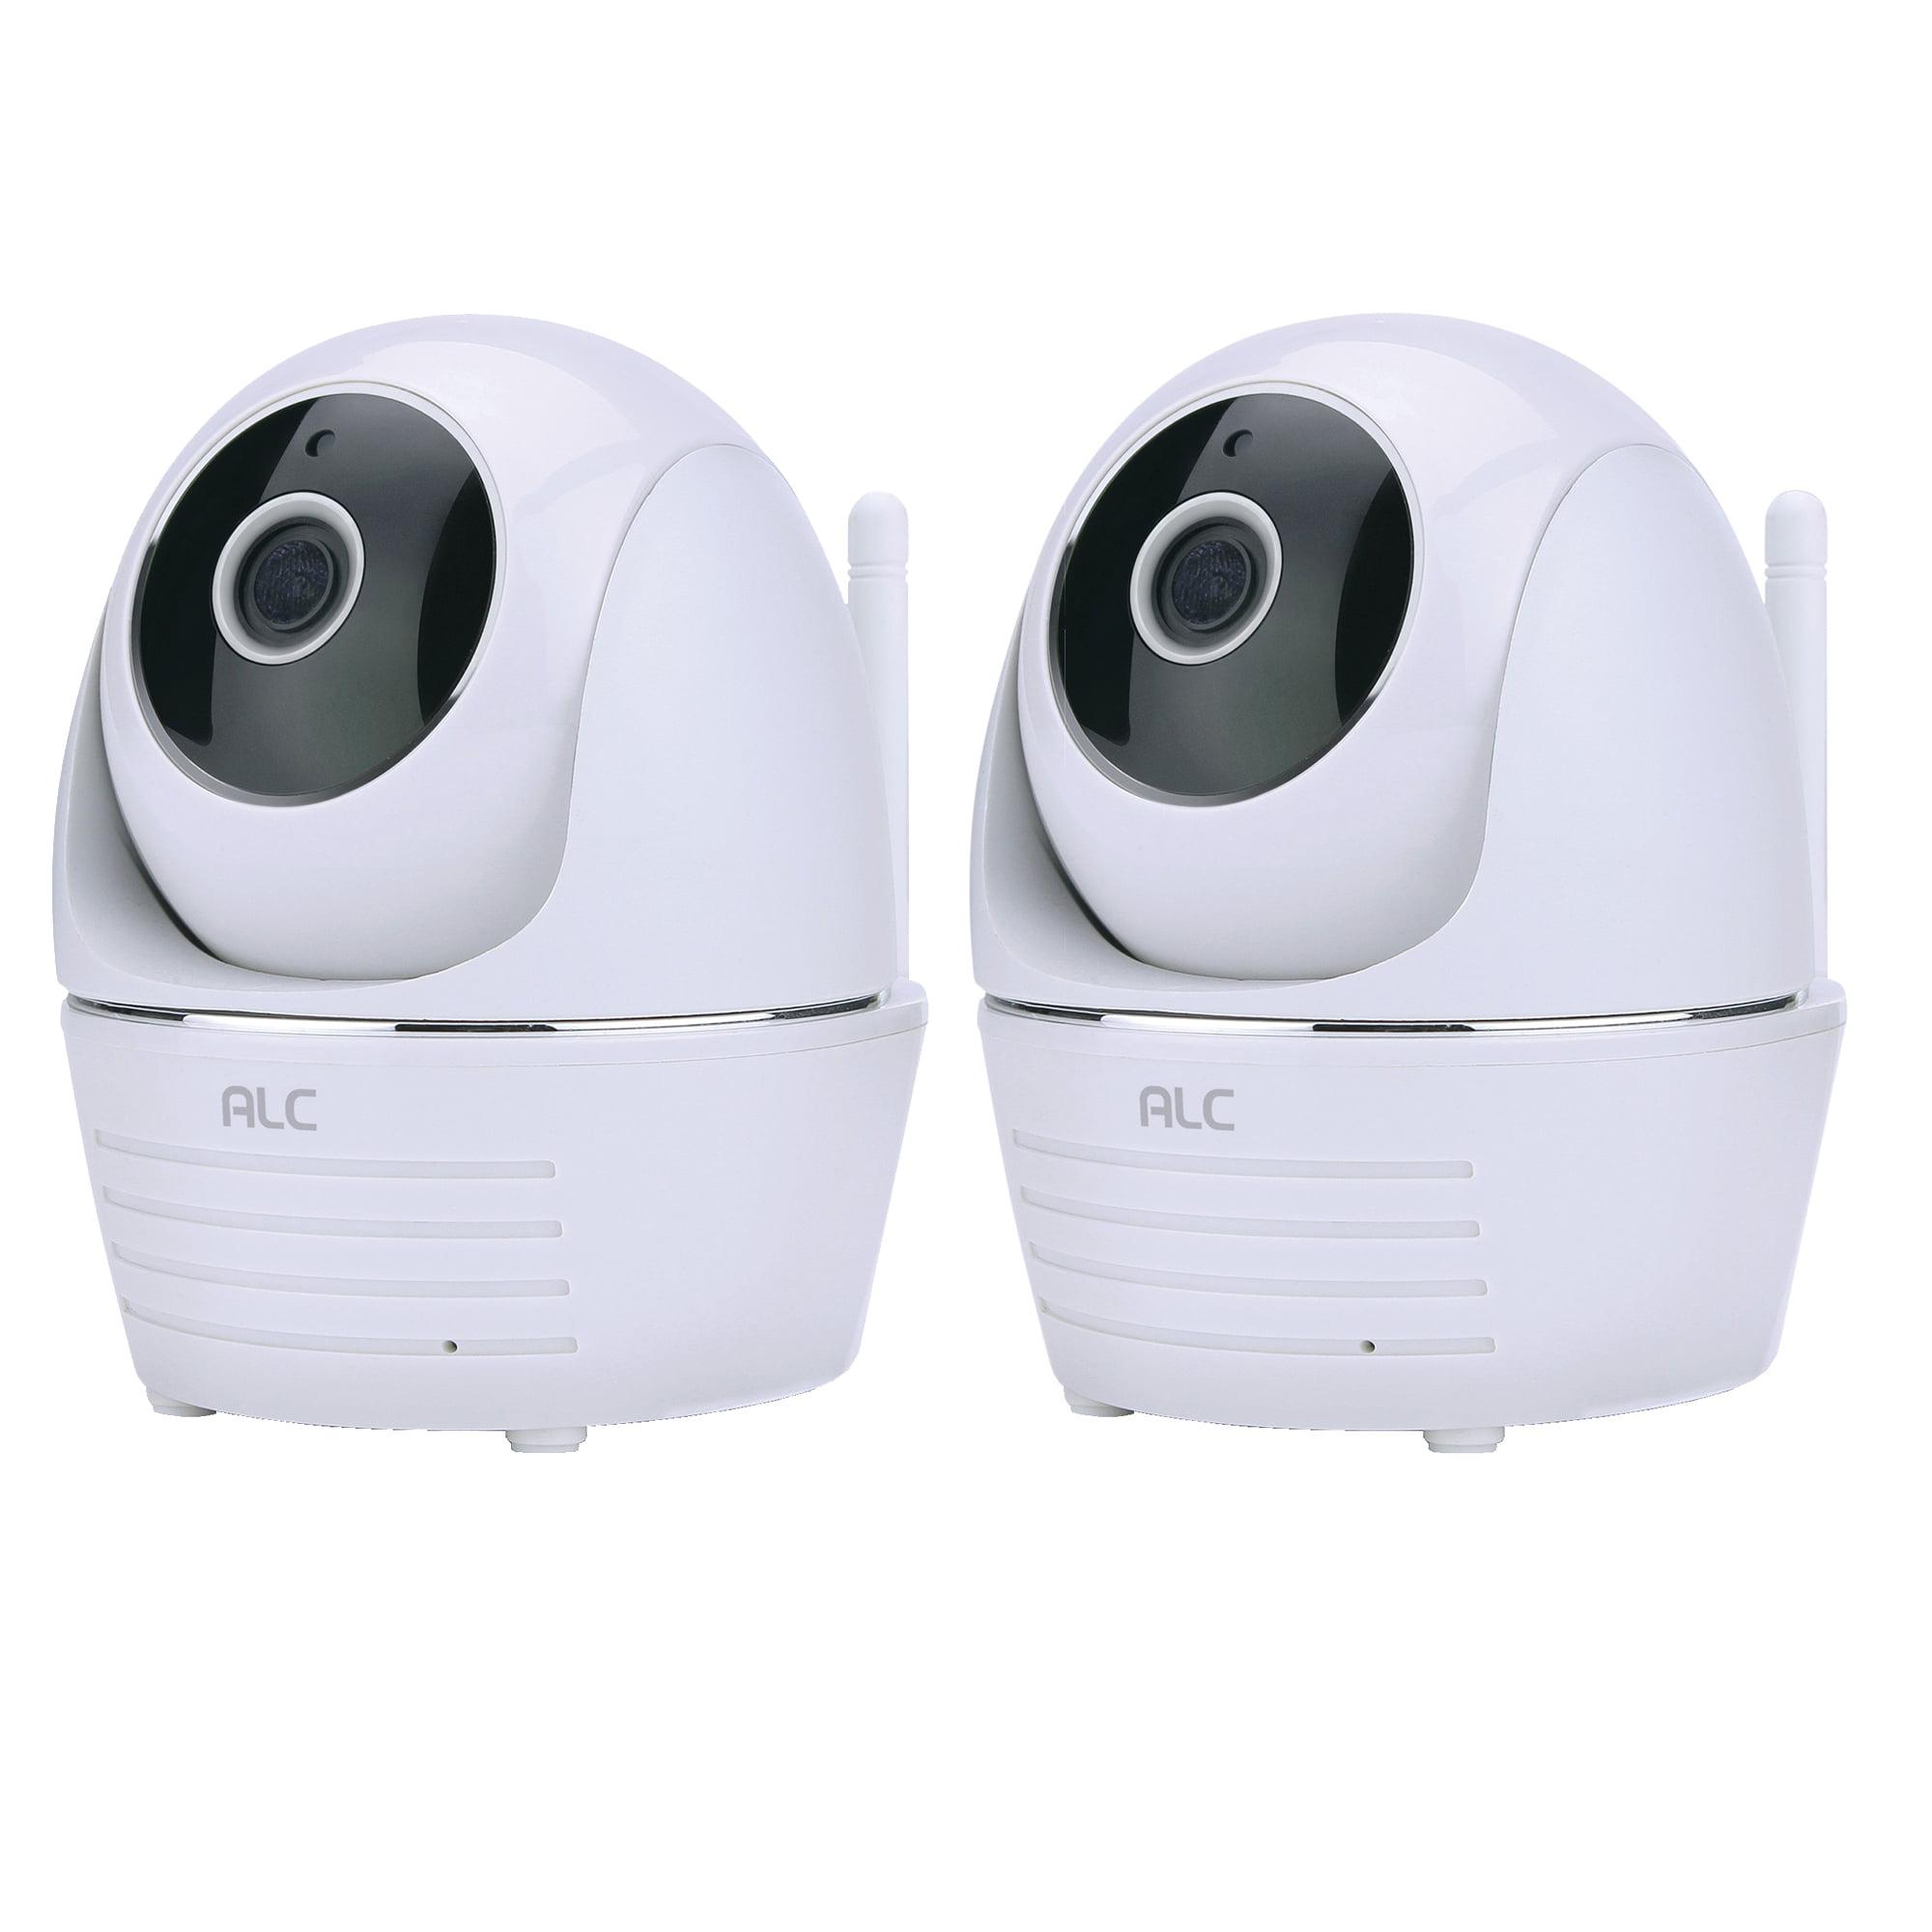 2 Pack ALC AWF23 1080P Full HD Pan & Tilt Wi-Fi Camera by ALC